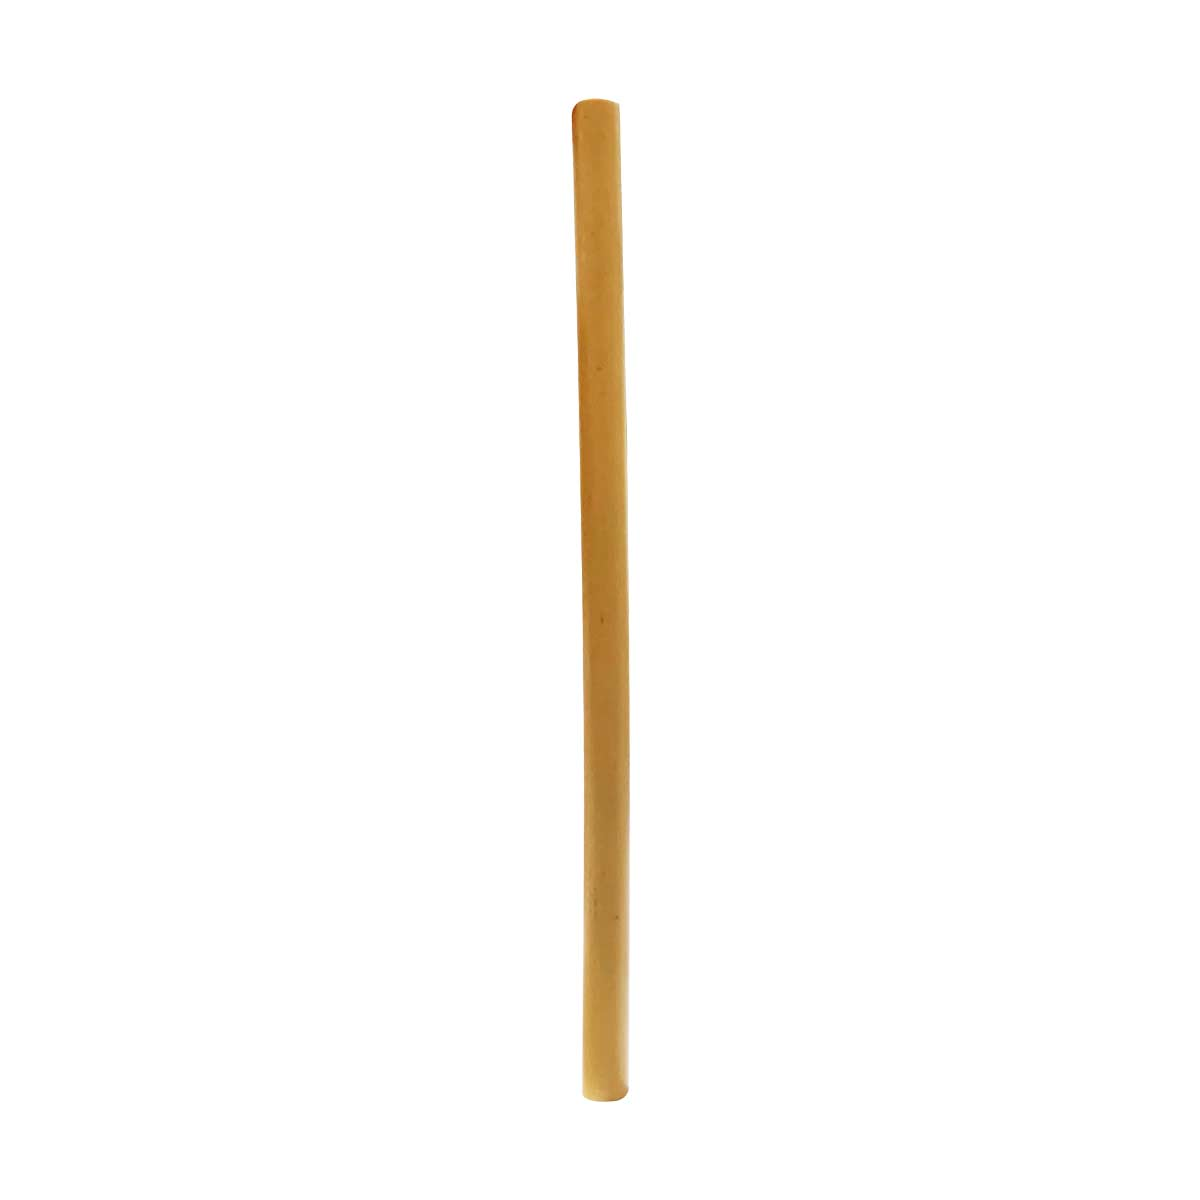 Kit Misto 5 em 1 - Bambu - Inox Rose Gold - Vidro + Escova + Bag